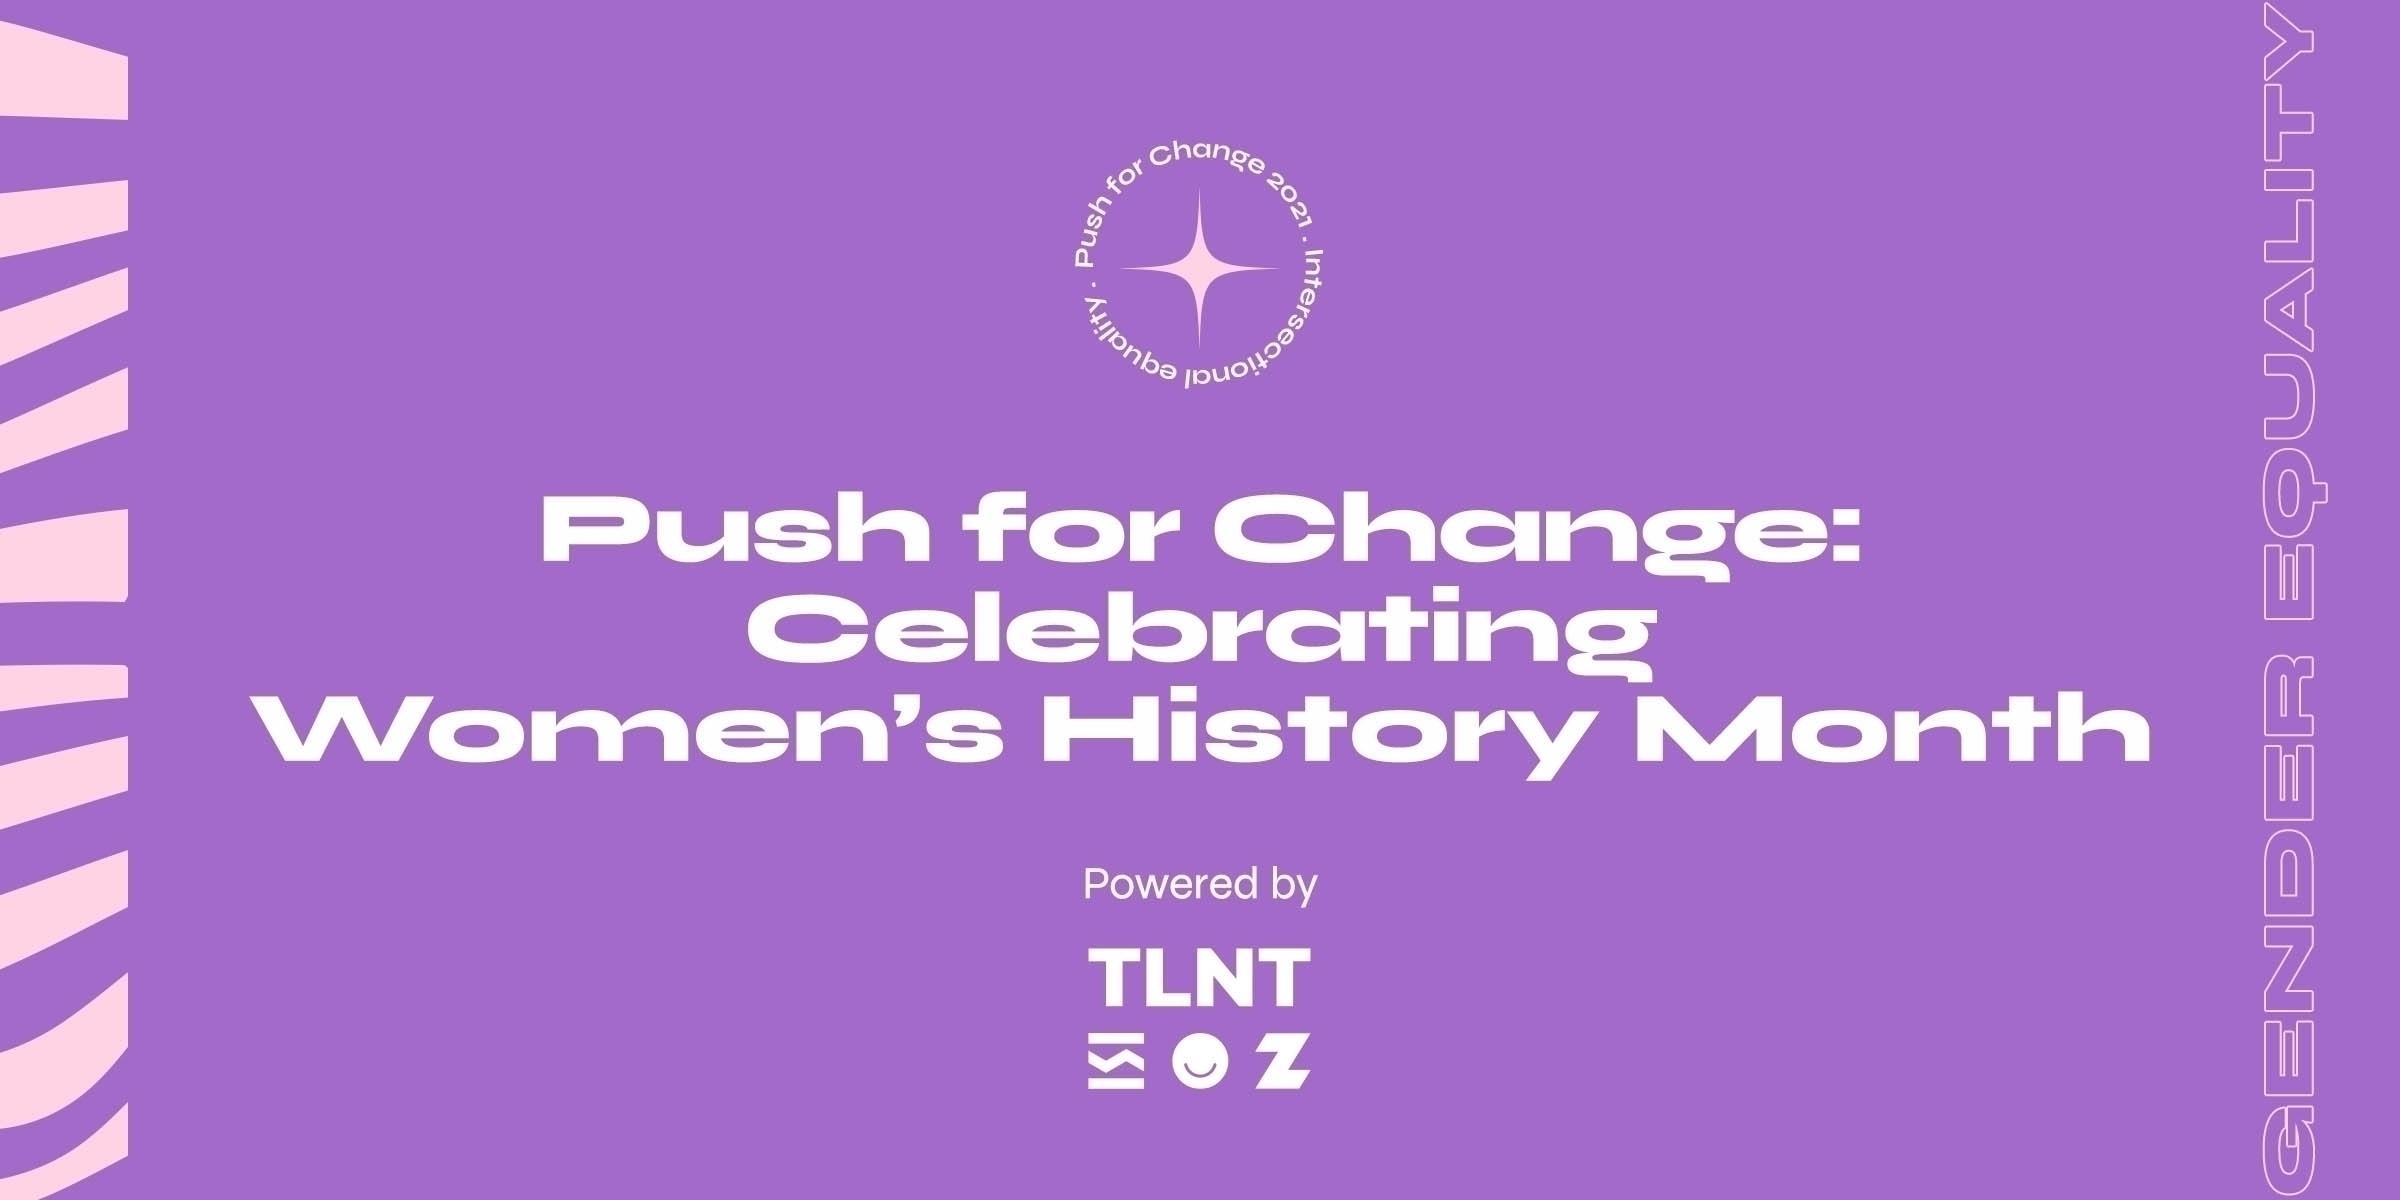 Push Change 2021: Celebrating H - elloblog   ello